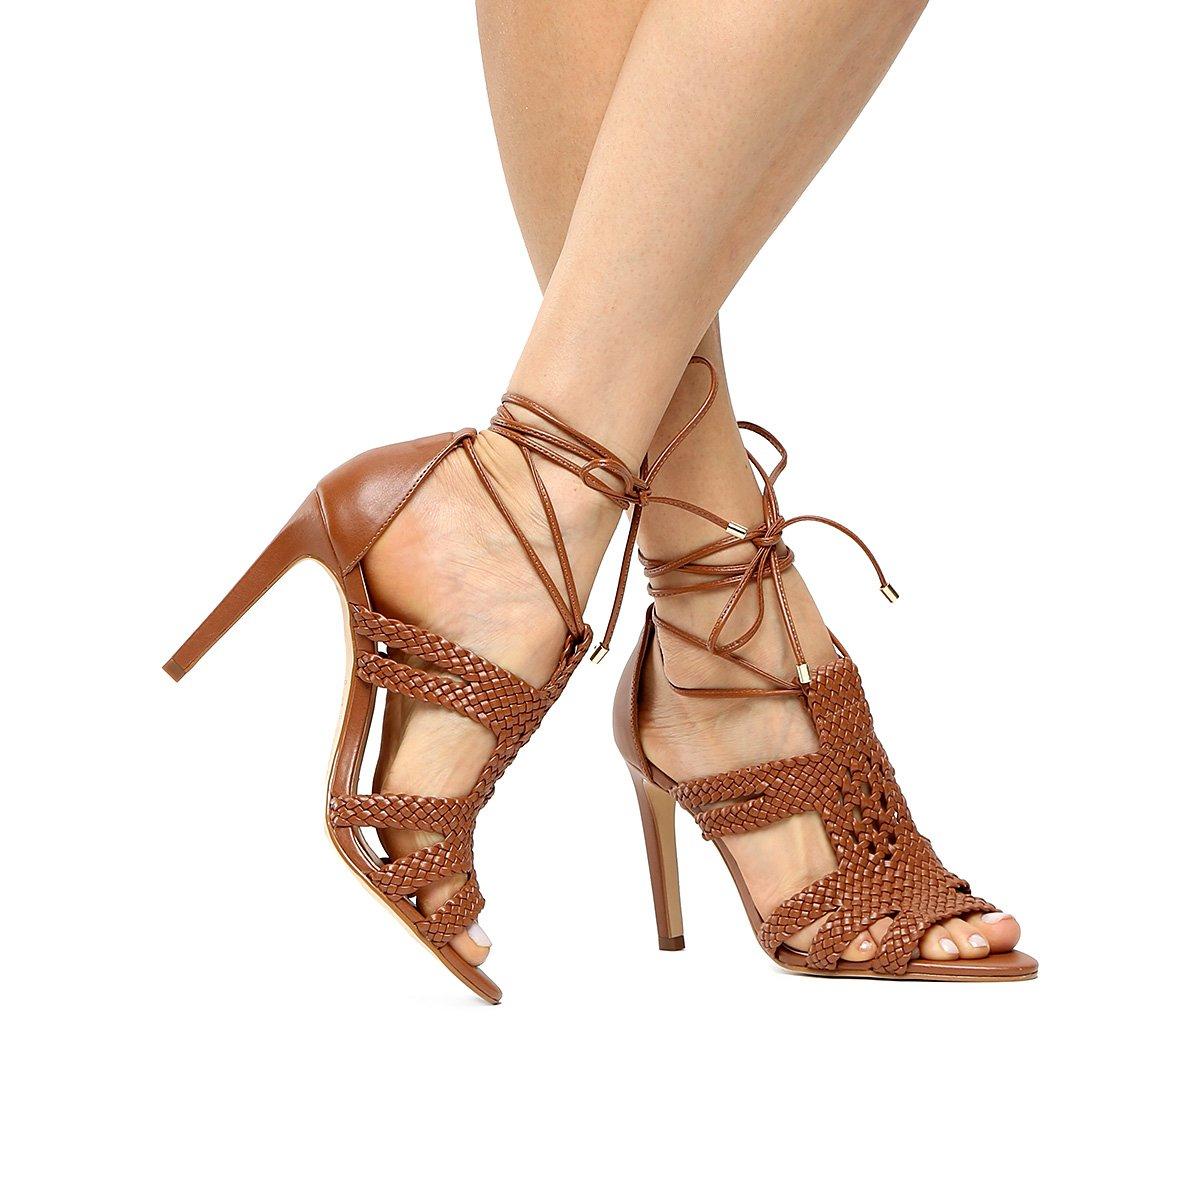 959af7cd6d086 Macramê Sandália Feminina Sandália Salto Alto Shoestock Caramelo Shoestock  fw5qX8 ...